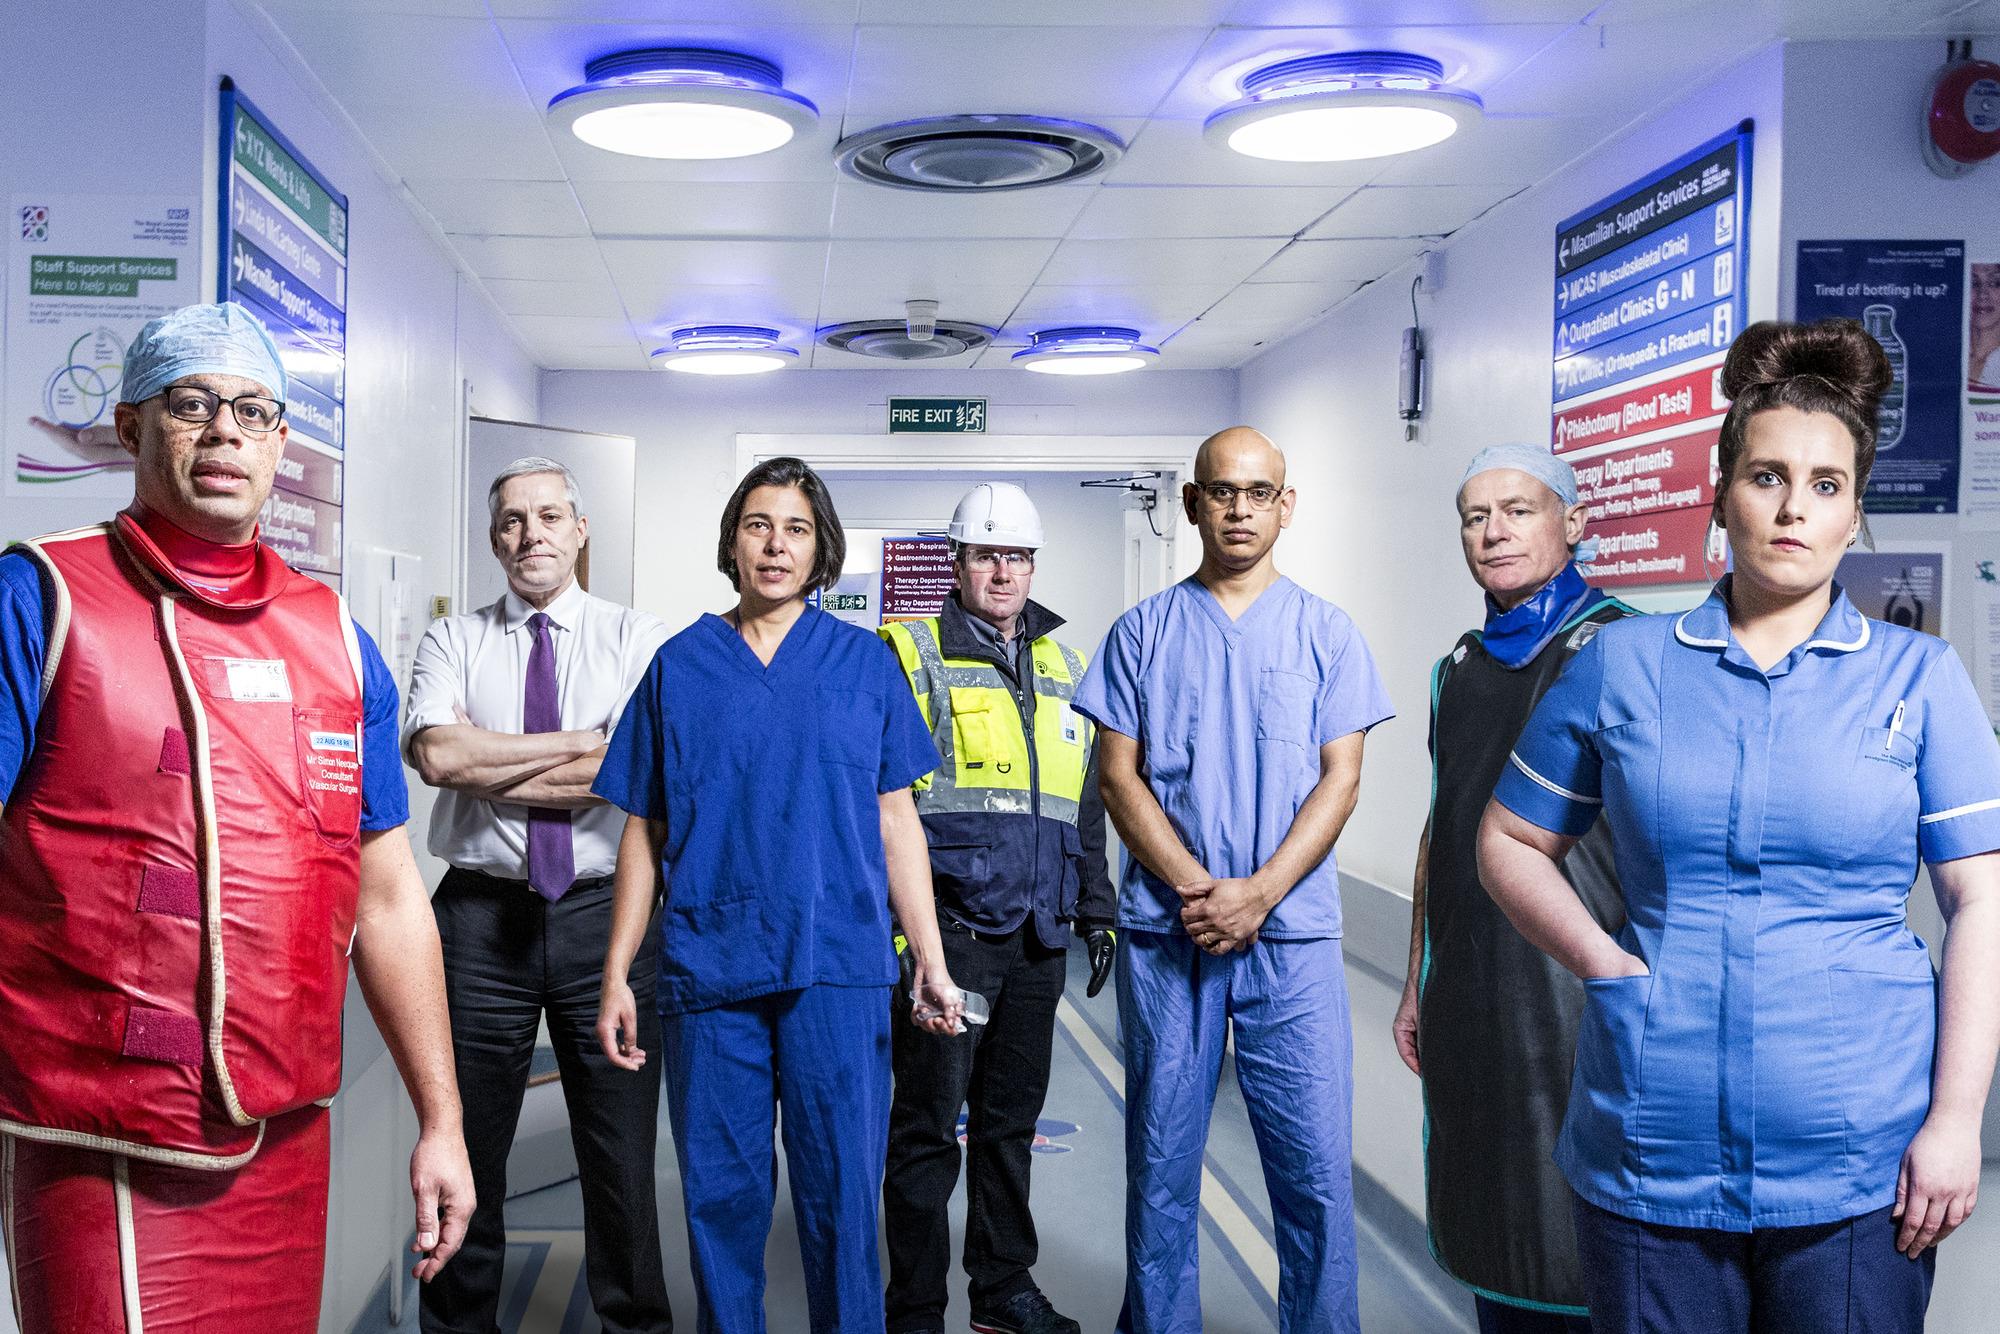 Hospital - Label1/BBC Two